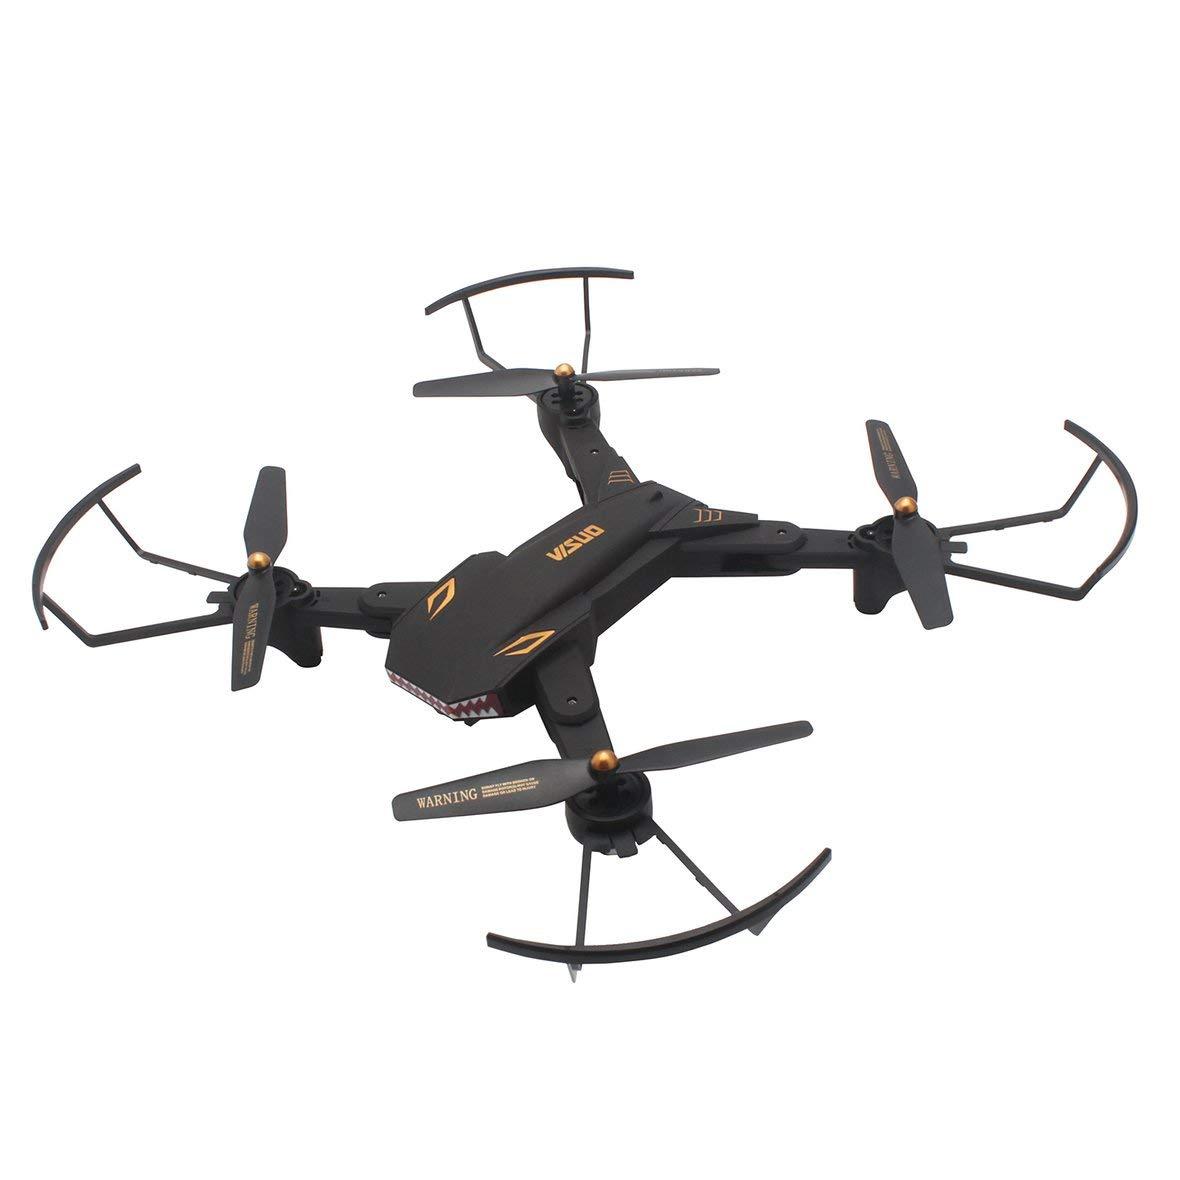 ToGames VISUO XS809S RC Drone WiFi FPV Selfie Cámara Altitude Hold Modo Headless Plegable One Key Return 3D Flip Quadcopter